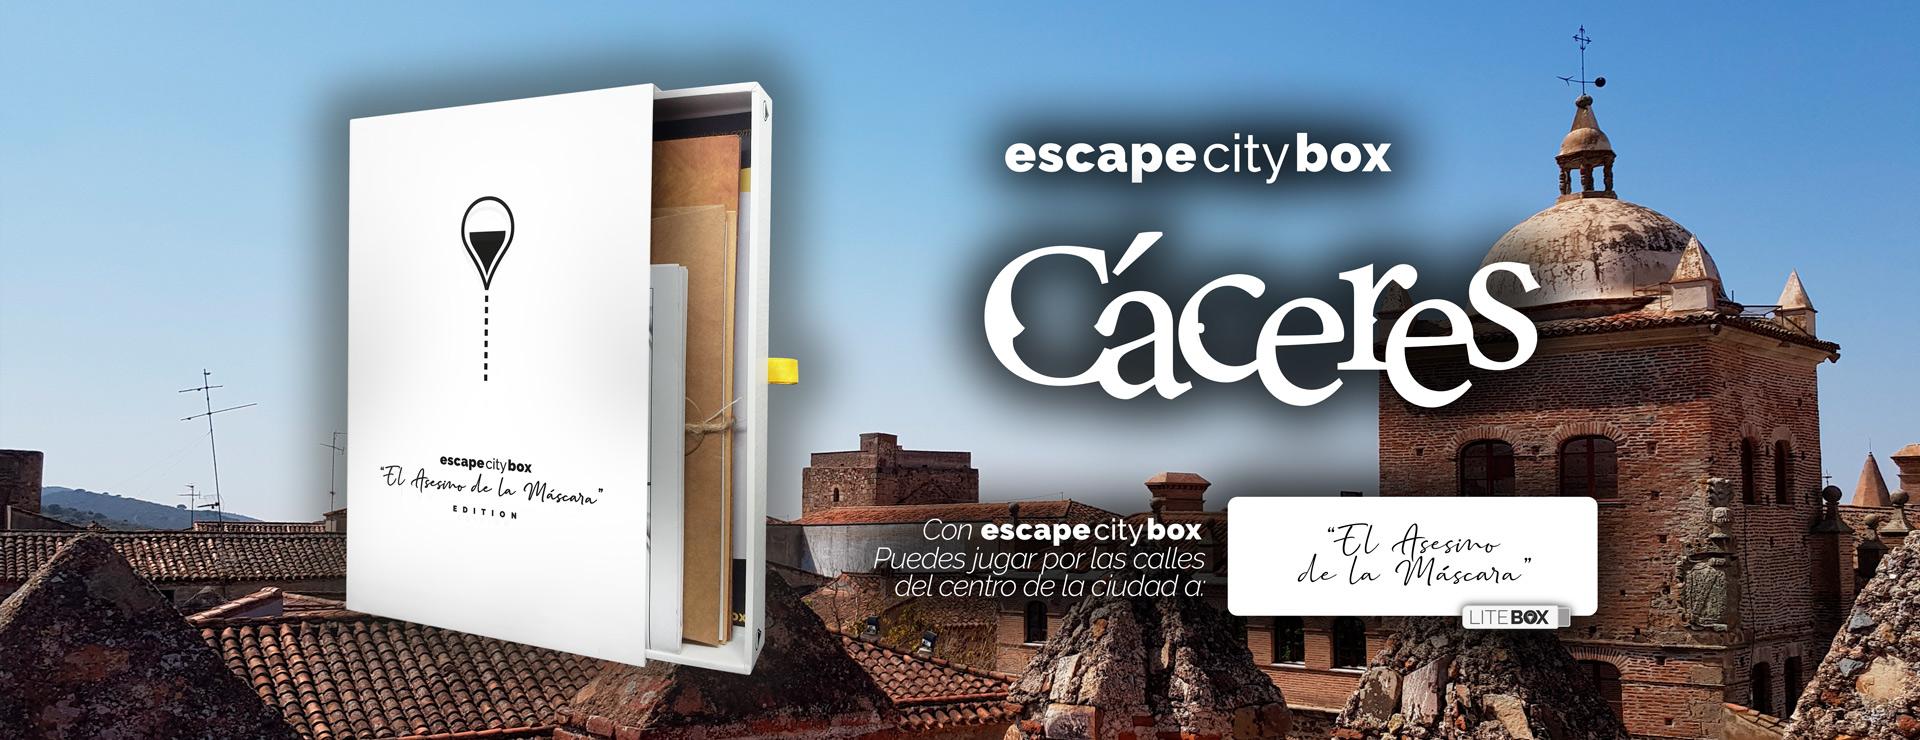 City games en Cáceres